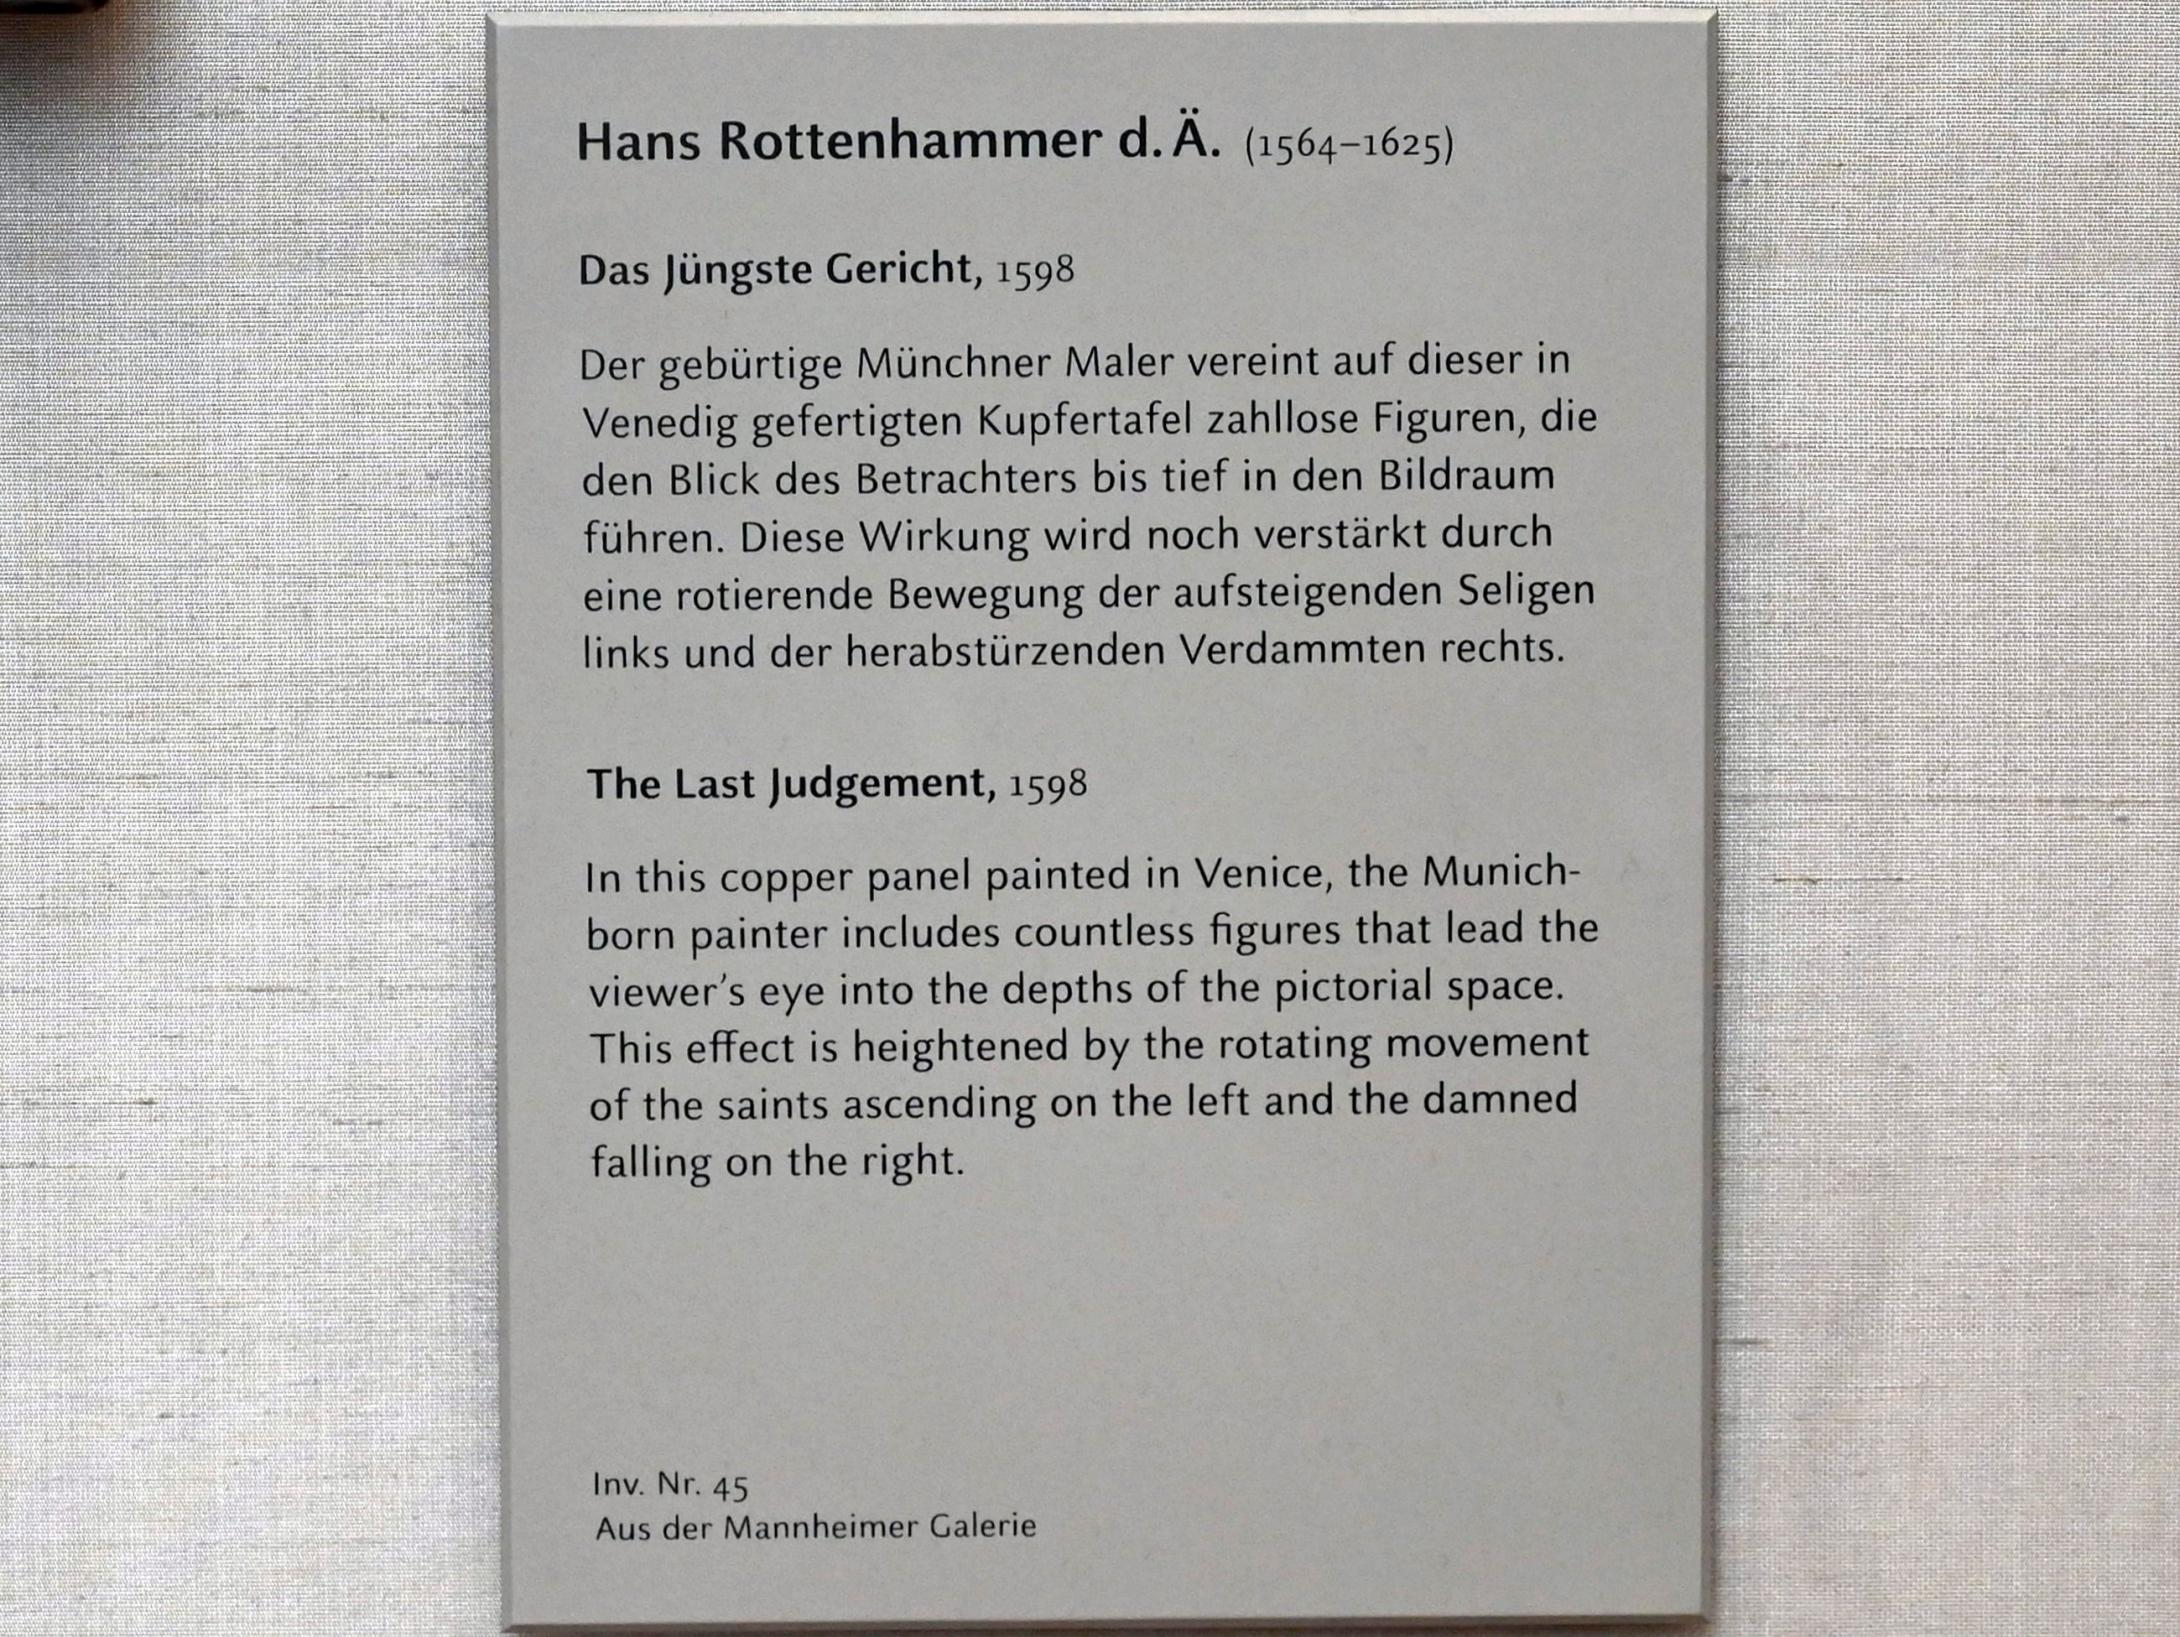 Johannes Rottenhammer der Ältere: Das Jüngste Gericht, 1598